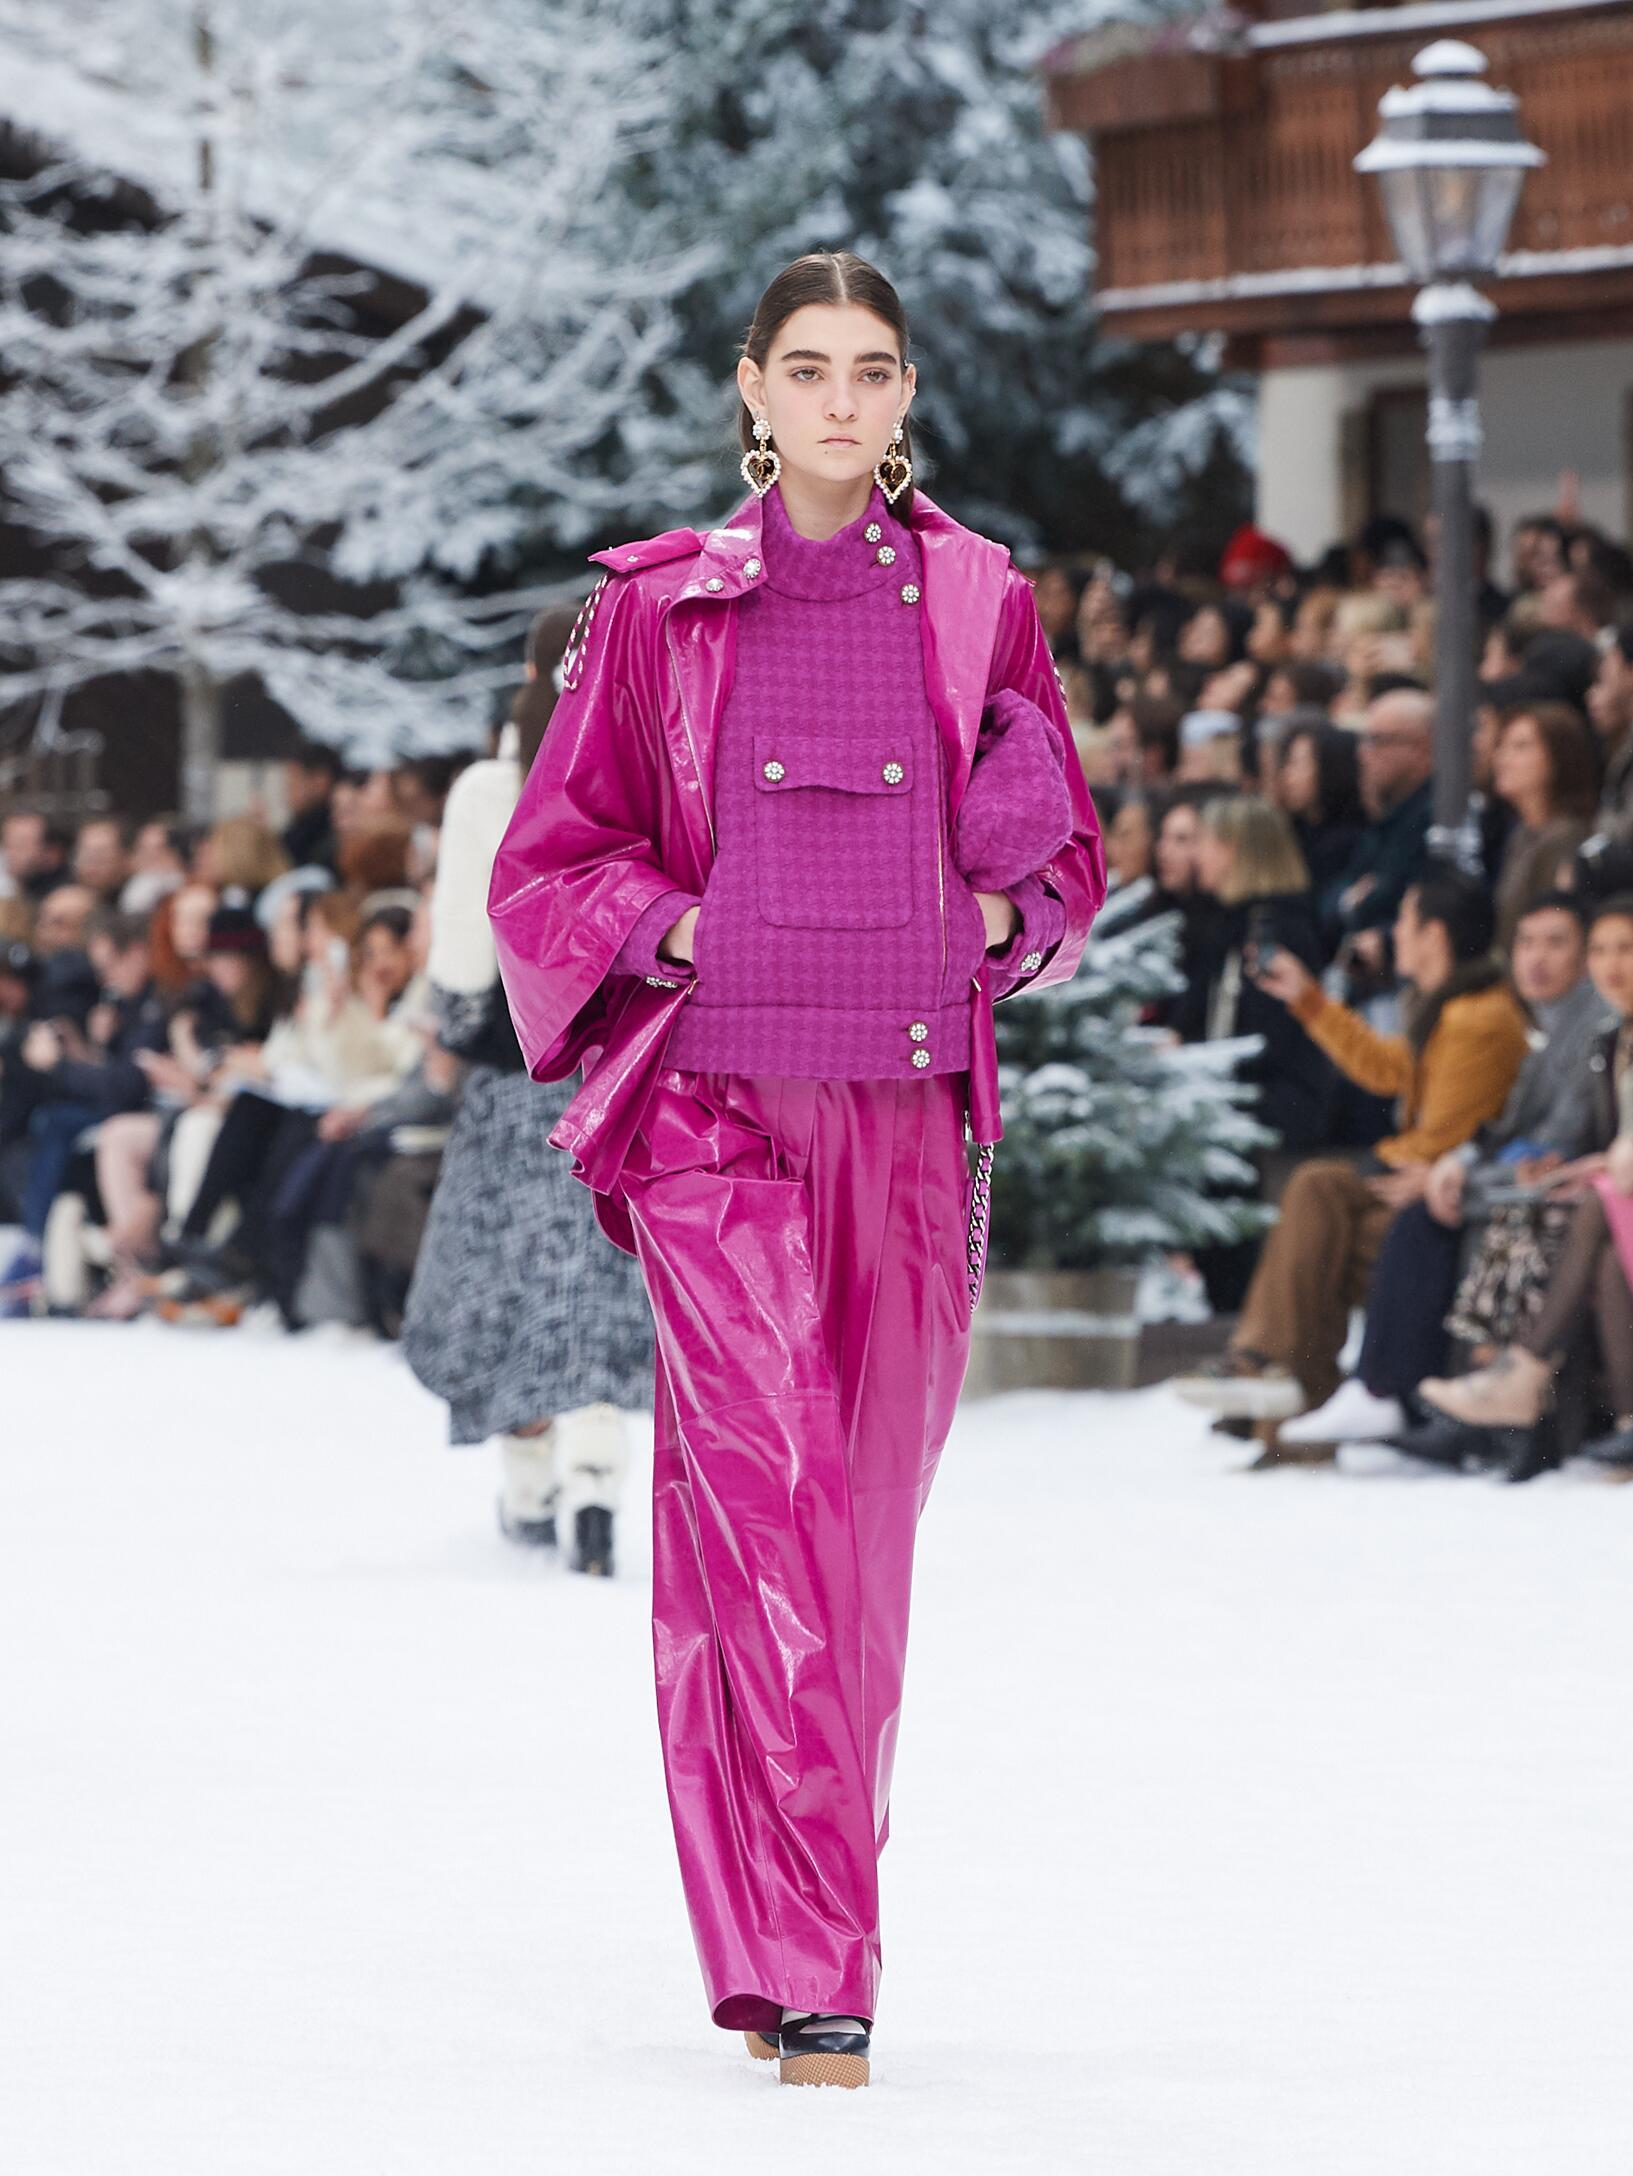 2019 Catwalk Chanel Woman Fashion Show Winter